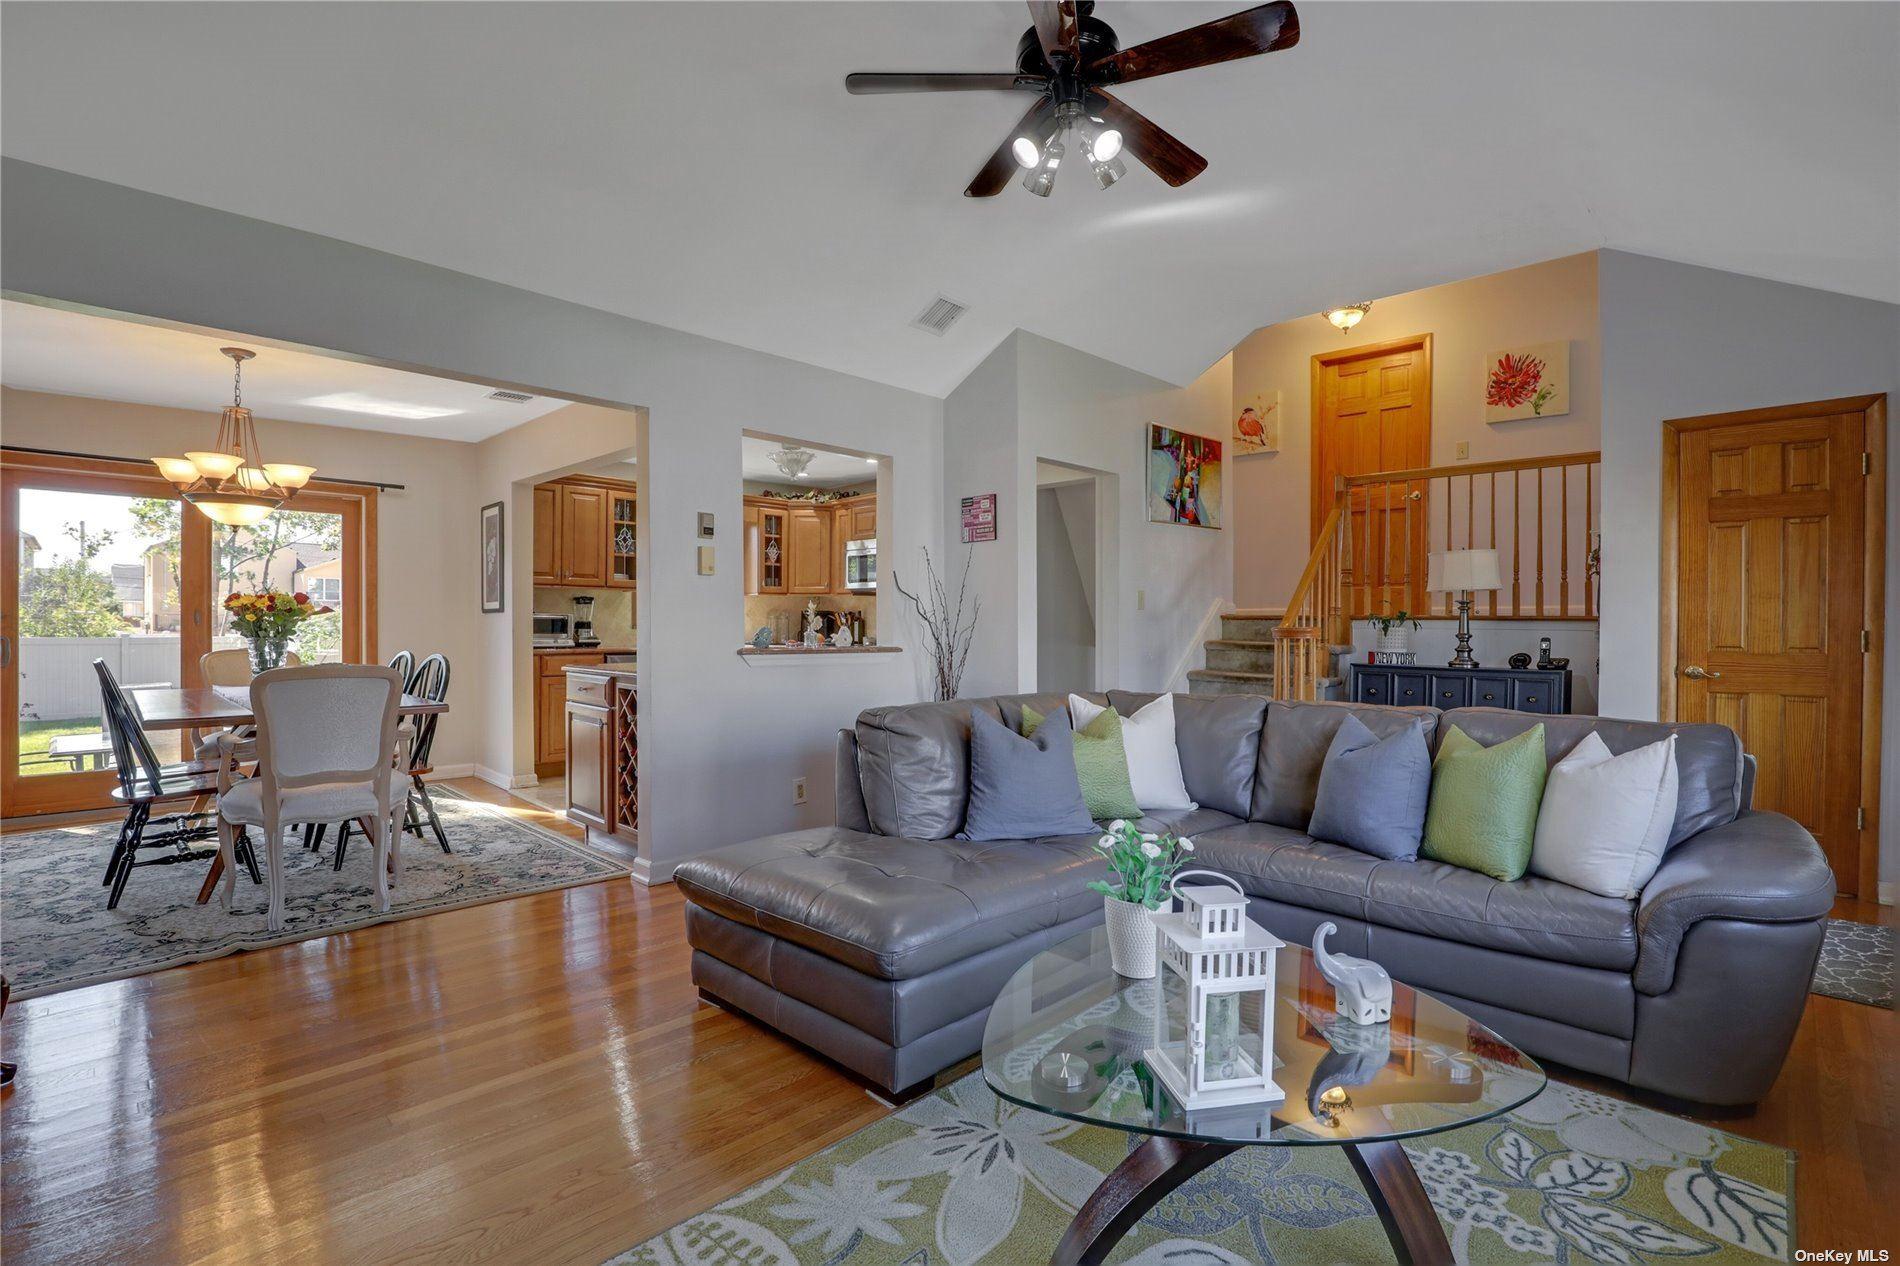 11 Dart Street, East Rockaway, NY 11518 - MLS#: 3354015